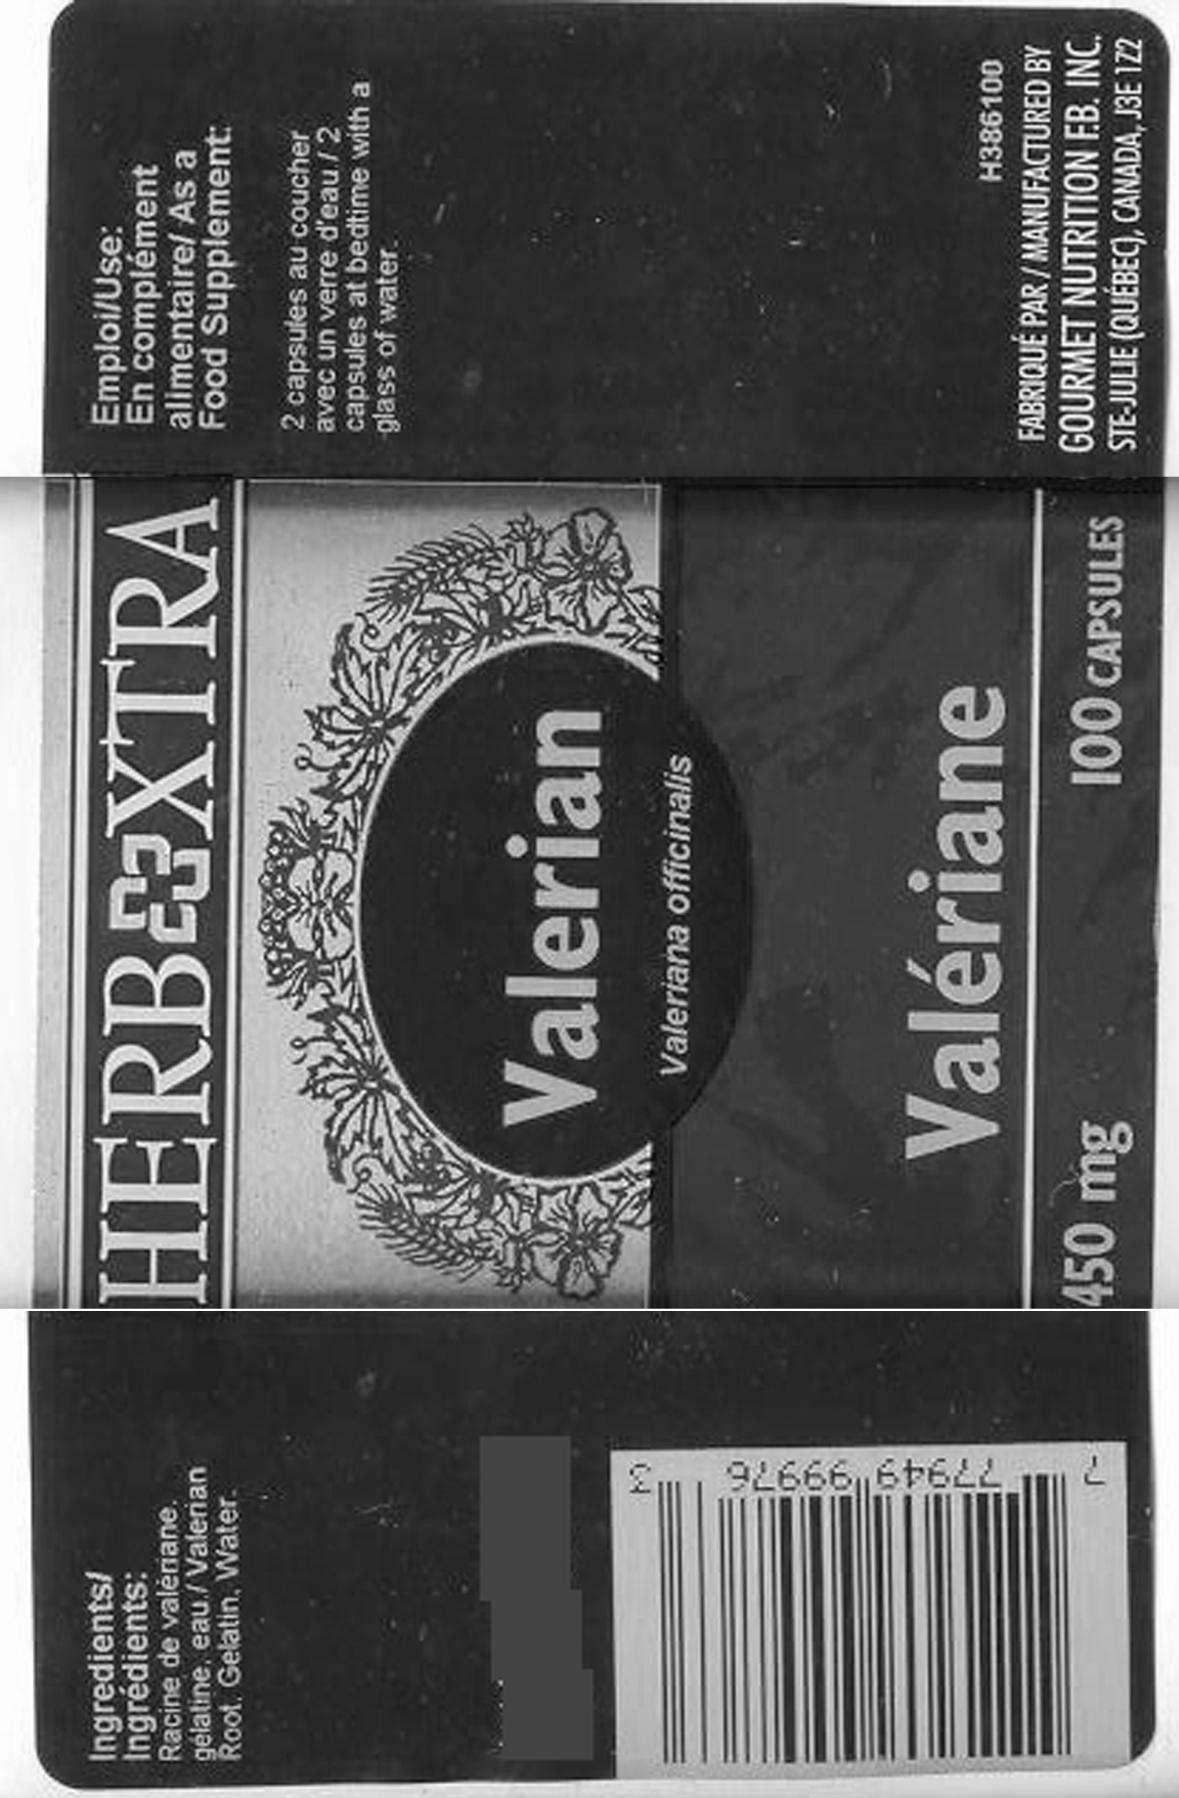 Valerian Root 450 mg - Label